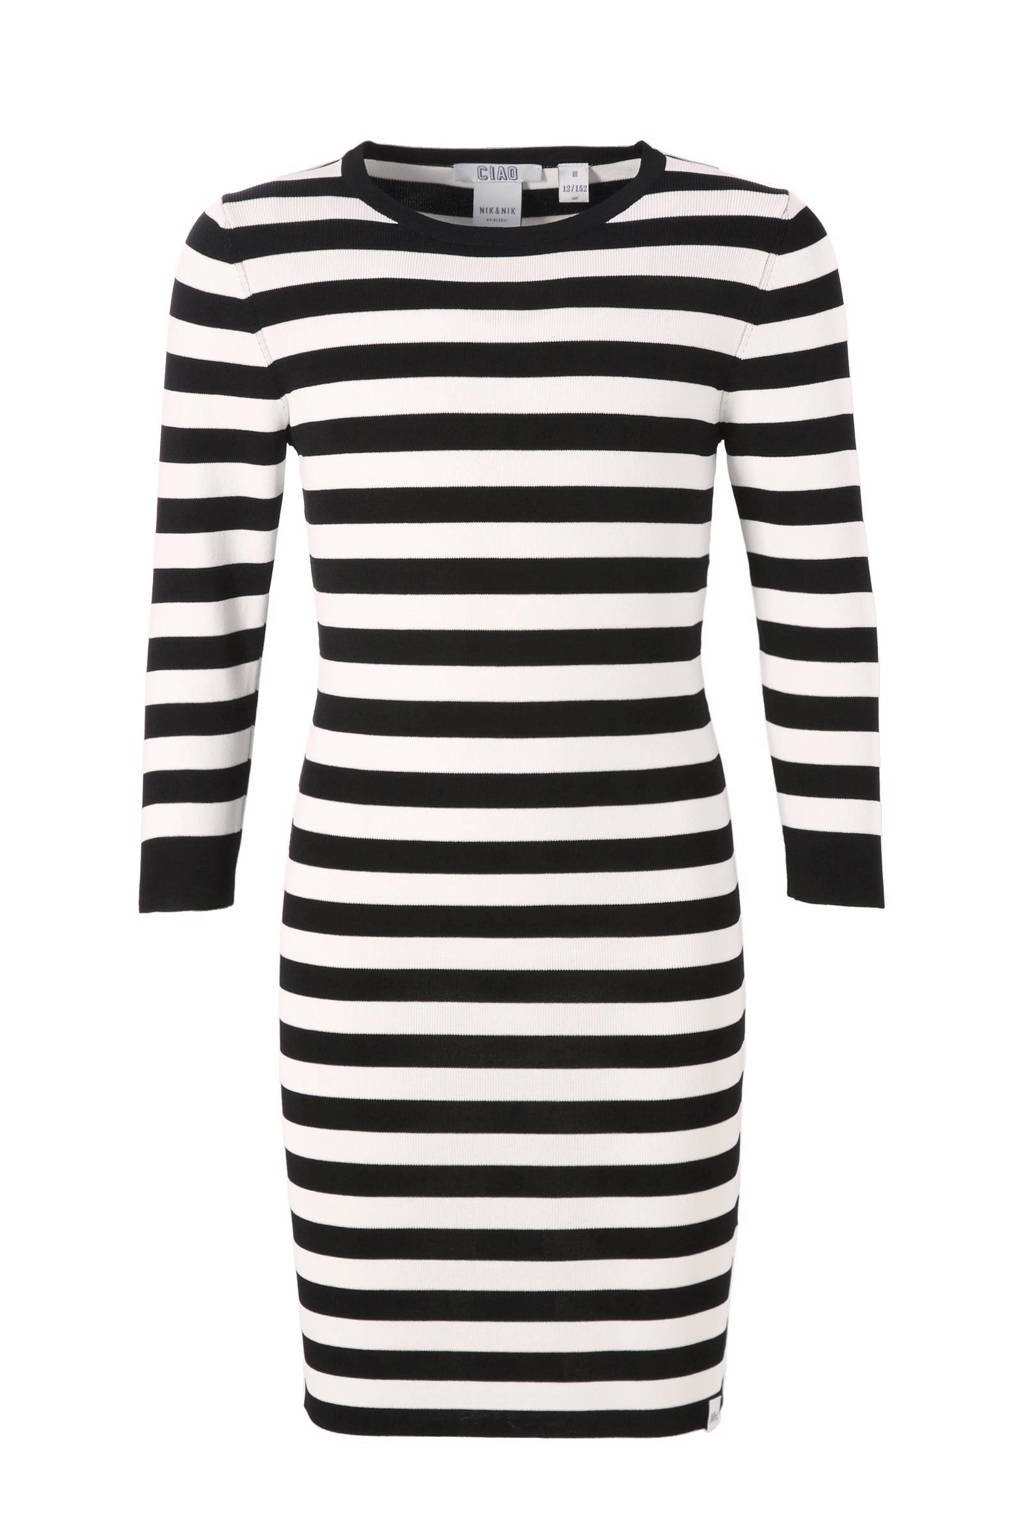 NIK&NIK jurk Jolie, Zwart/wit